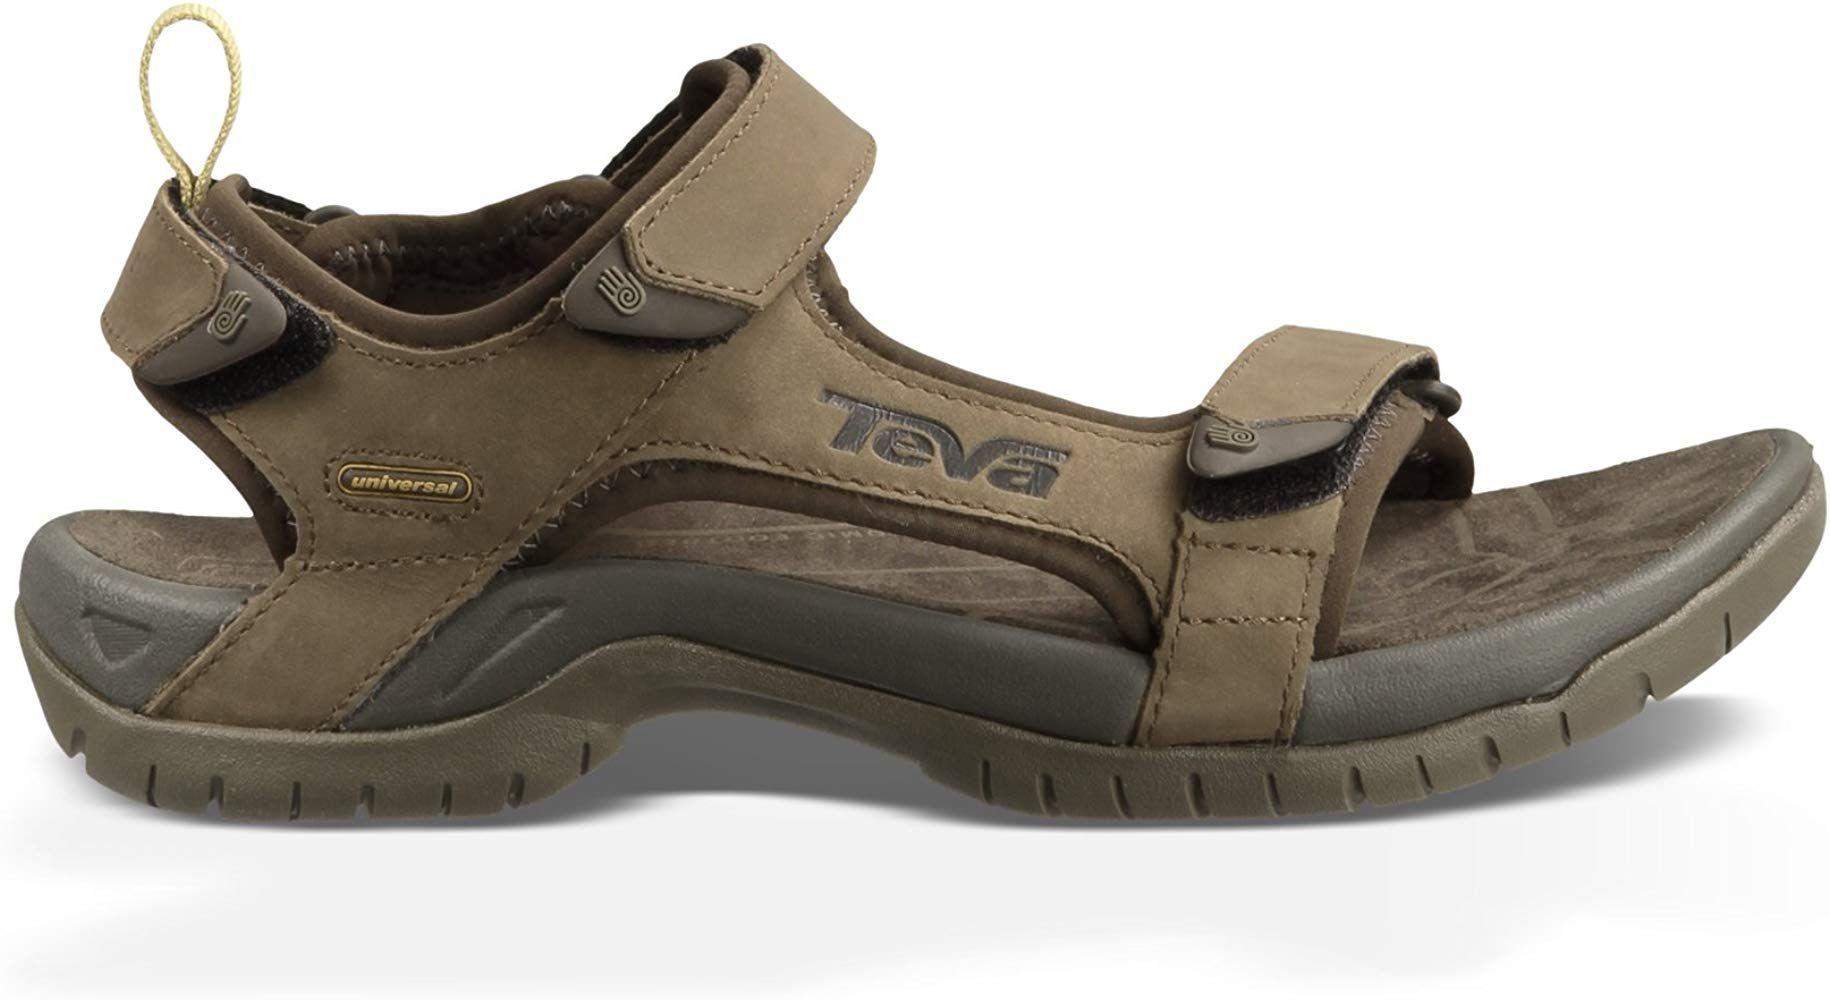 Teva Men's Tanza Leather Brown Sandal 1000183 13 UK, 14 US